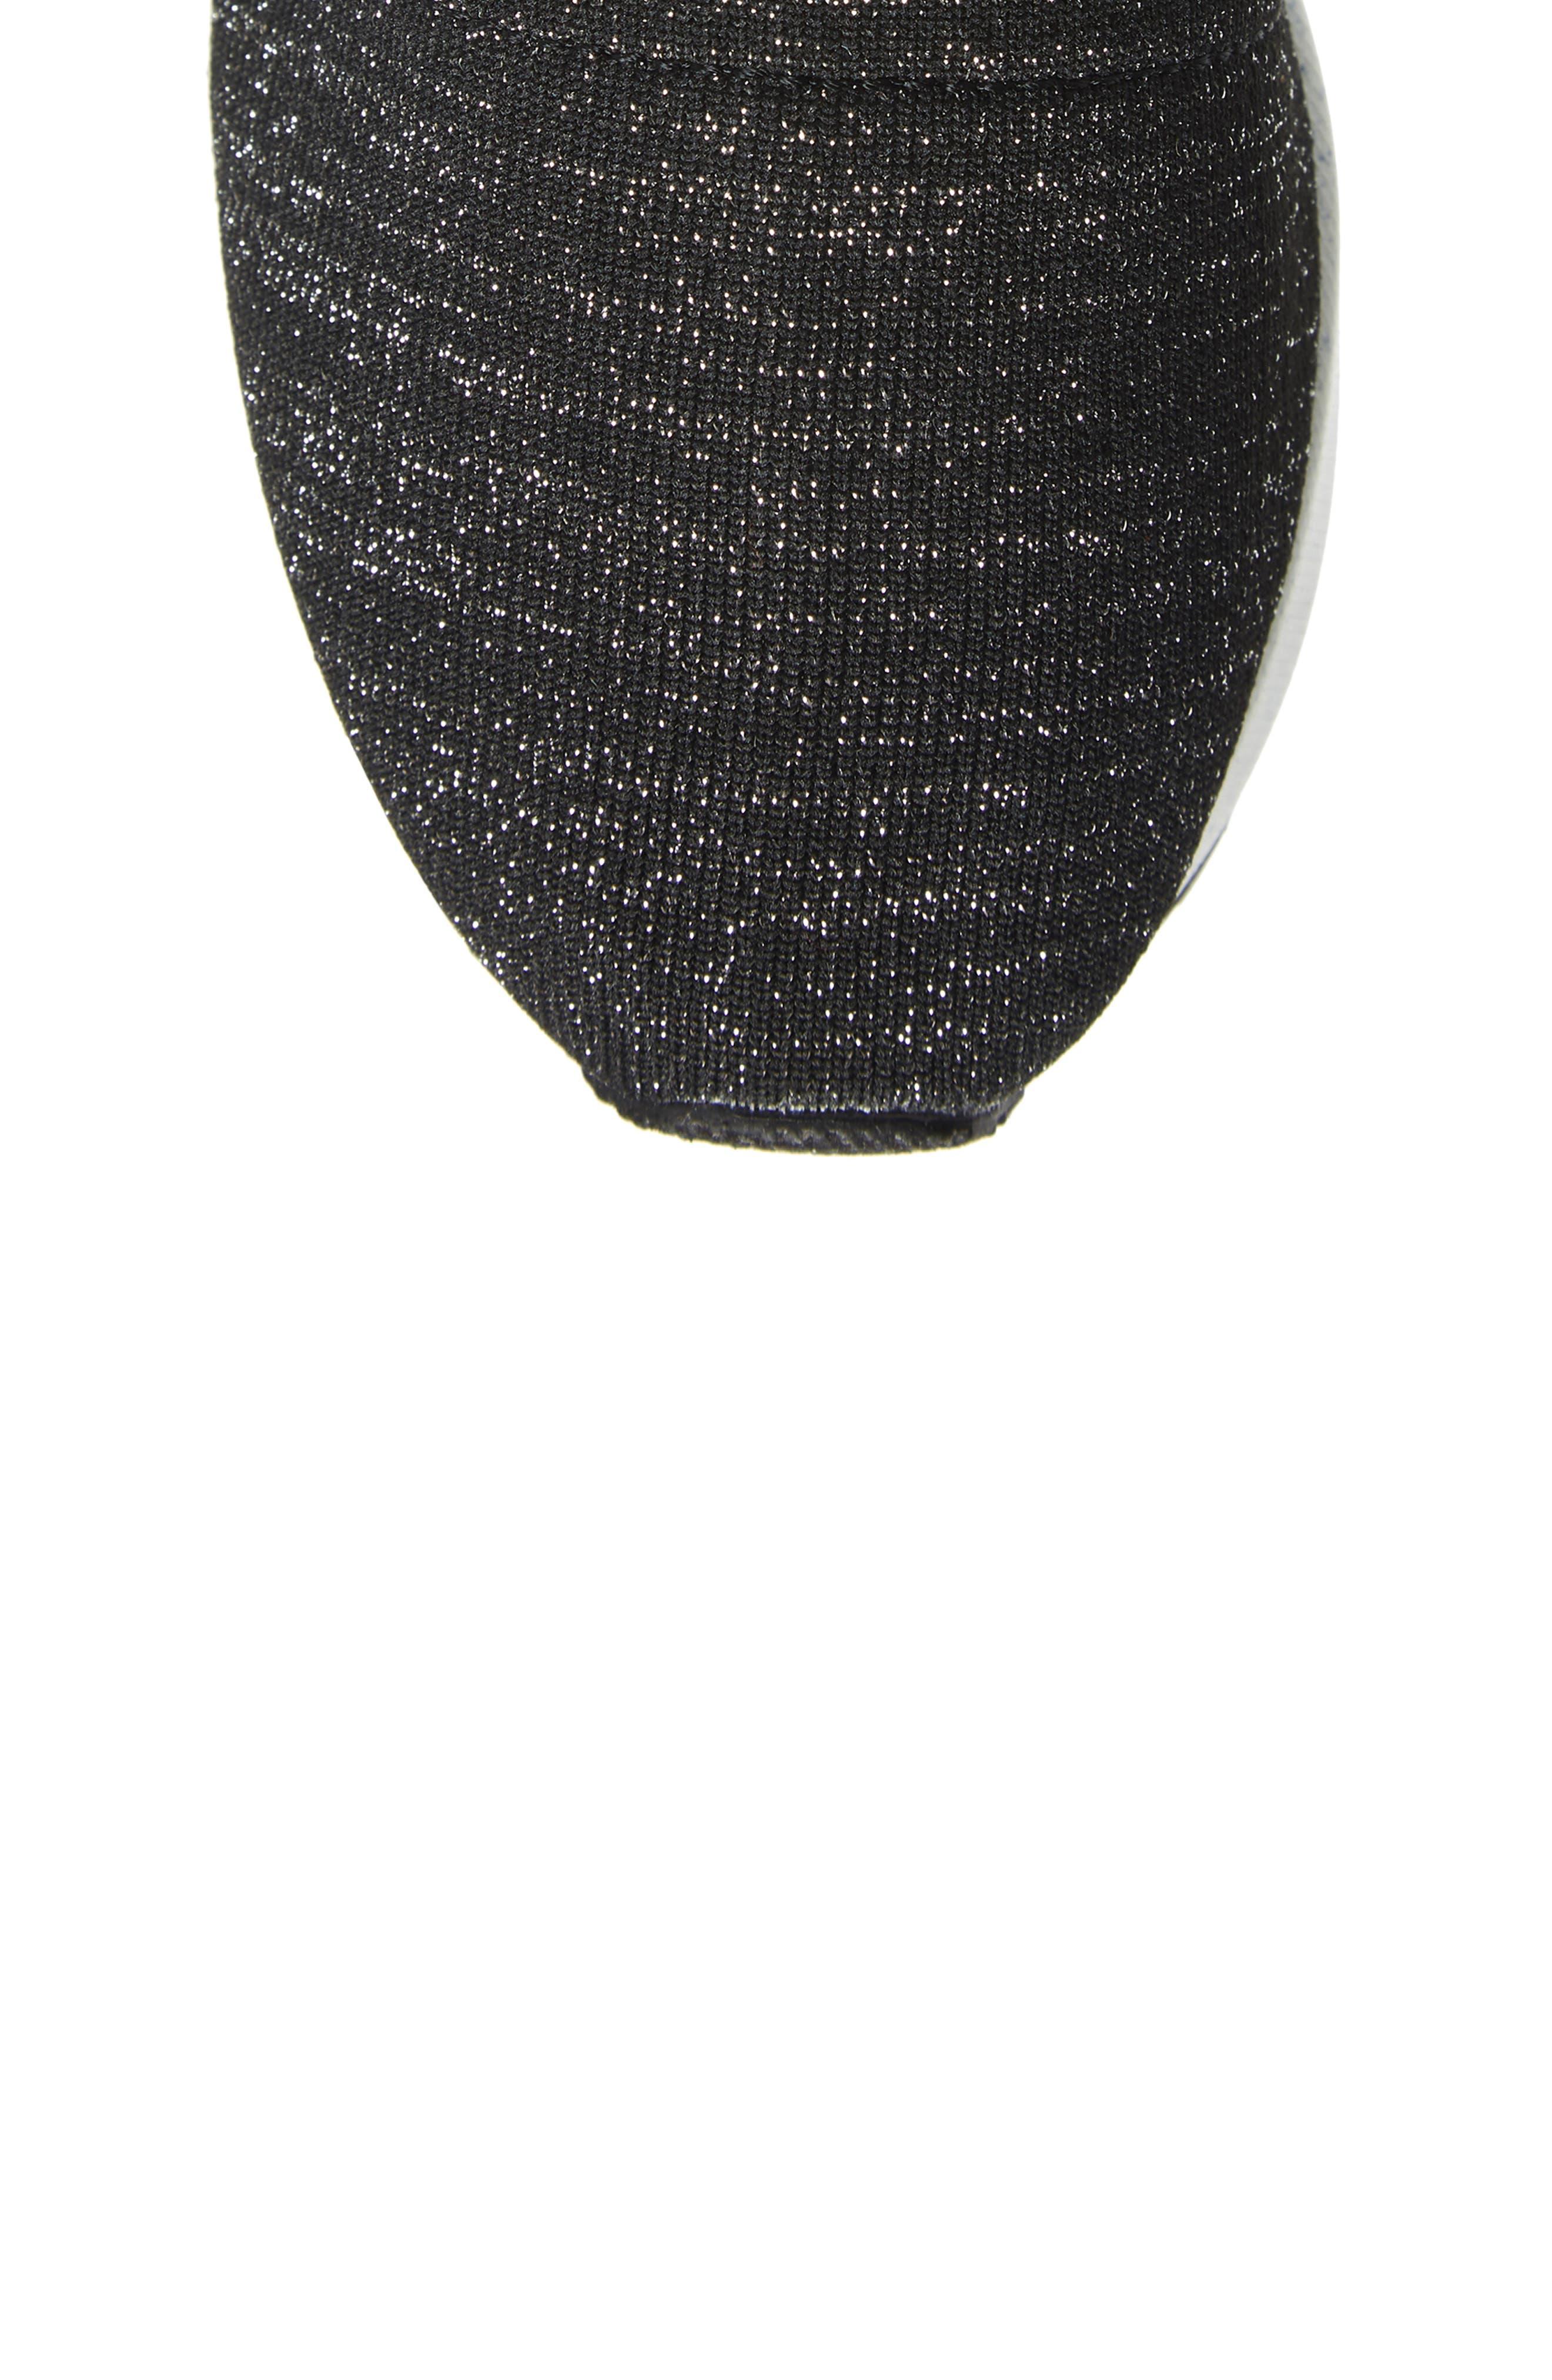 MICHAEL MICHAEL KORS, Neo Flex Metallic Wedge Sneaker, Alternate thumbnail 5, color, BLACK METALLIC